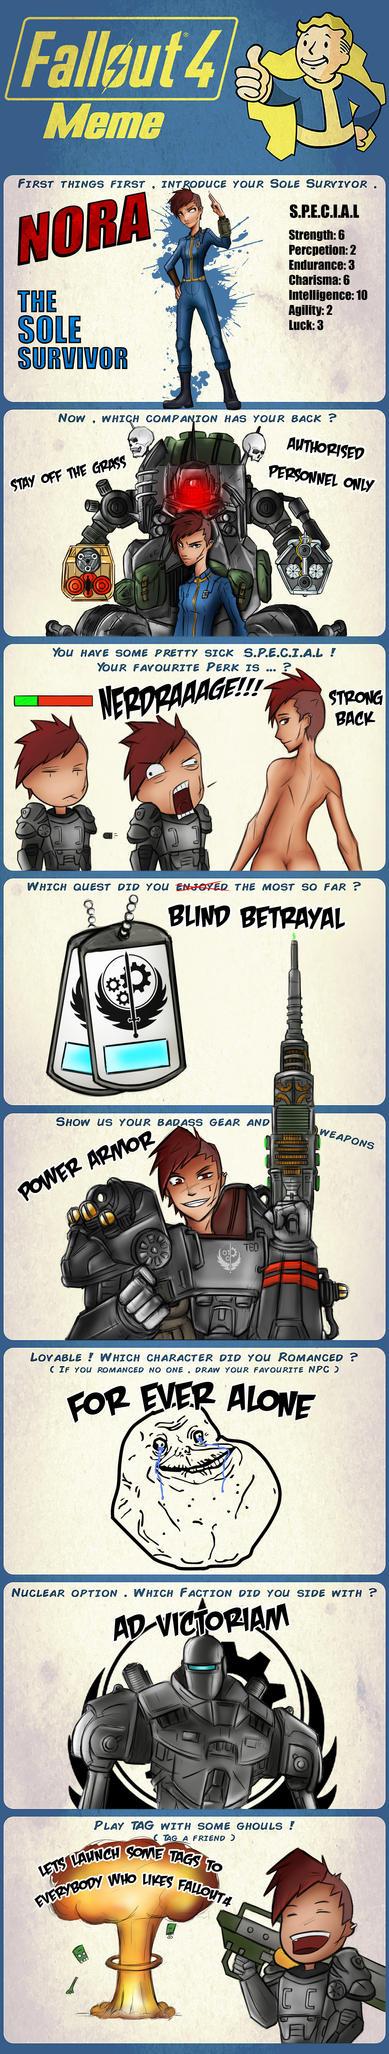 Fallout 4 Meme by Artas9000 on DeviantArt